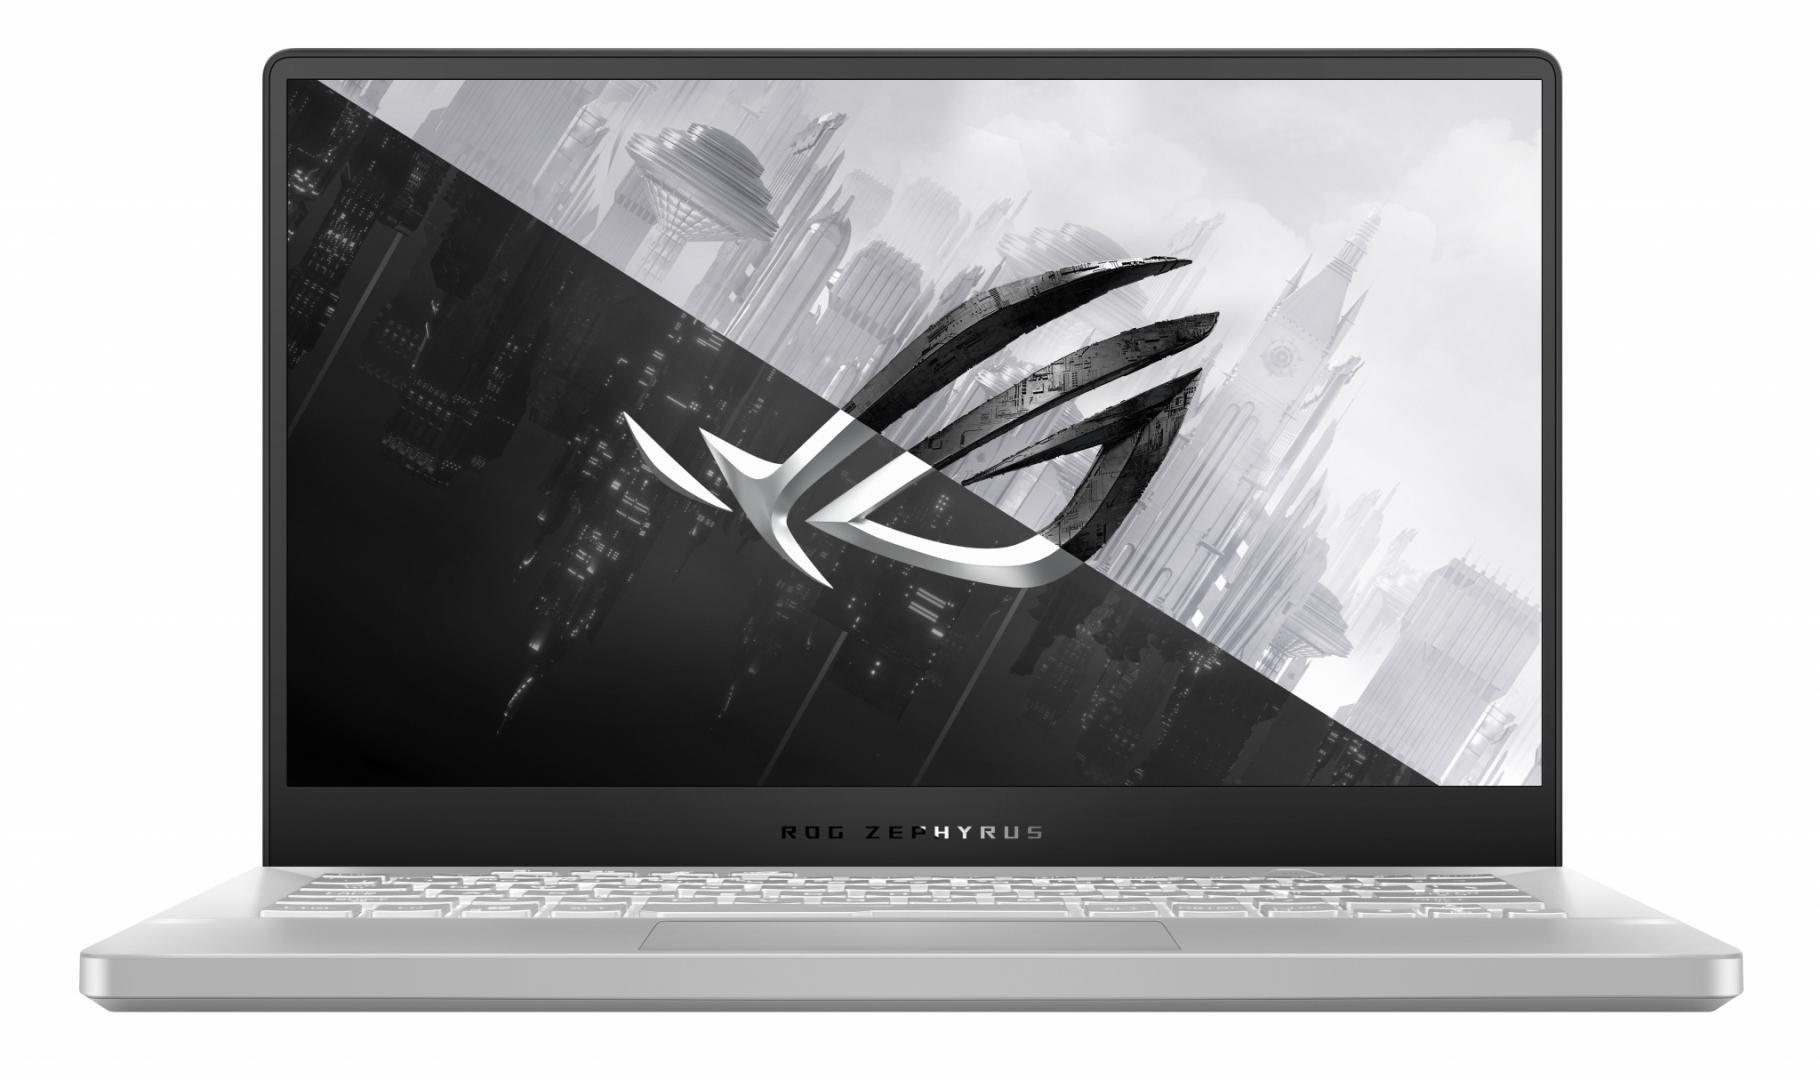 Laptop Gaming ASUS ROG Zephyrus G14 GA401QE-HZ052T, 14-inch, FHD (1920 x 1080) 16:9, Anti-glare display, IPS-level, AMD Ryzen™ 7 5800HS Processor 3.0GHz(16MCache,upto4.3GHz), NVIDIA®GeForceRTX™3050Ti Laptop GPU, 8GB DDR4 on board + 8GB DDR4-3200 SO-DIMM, 512GB M.2 NVMe™ PCIe® 3.0 SSD - imaginea 2